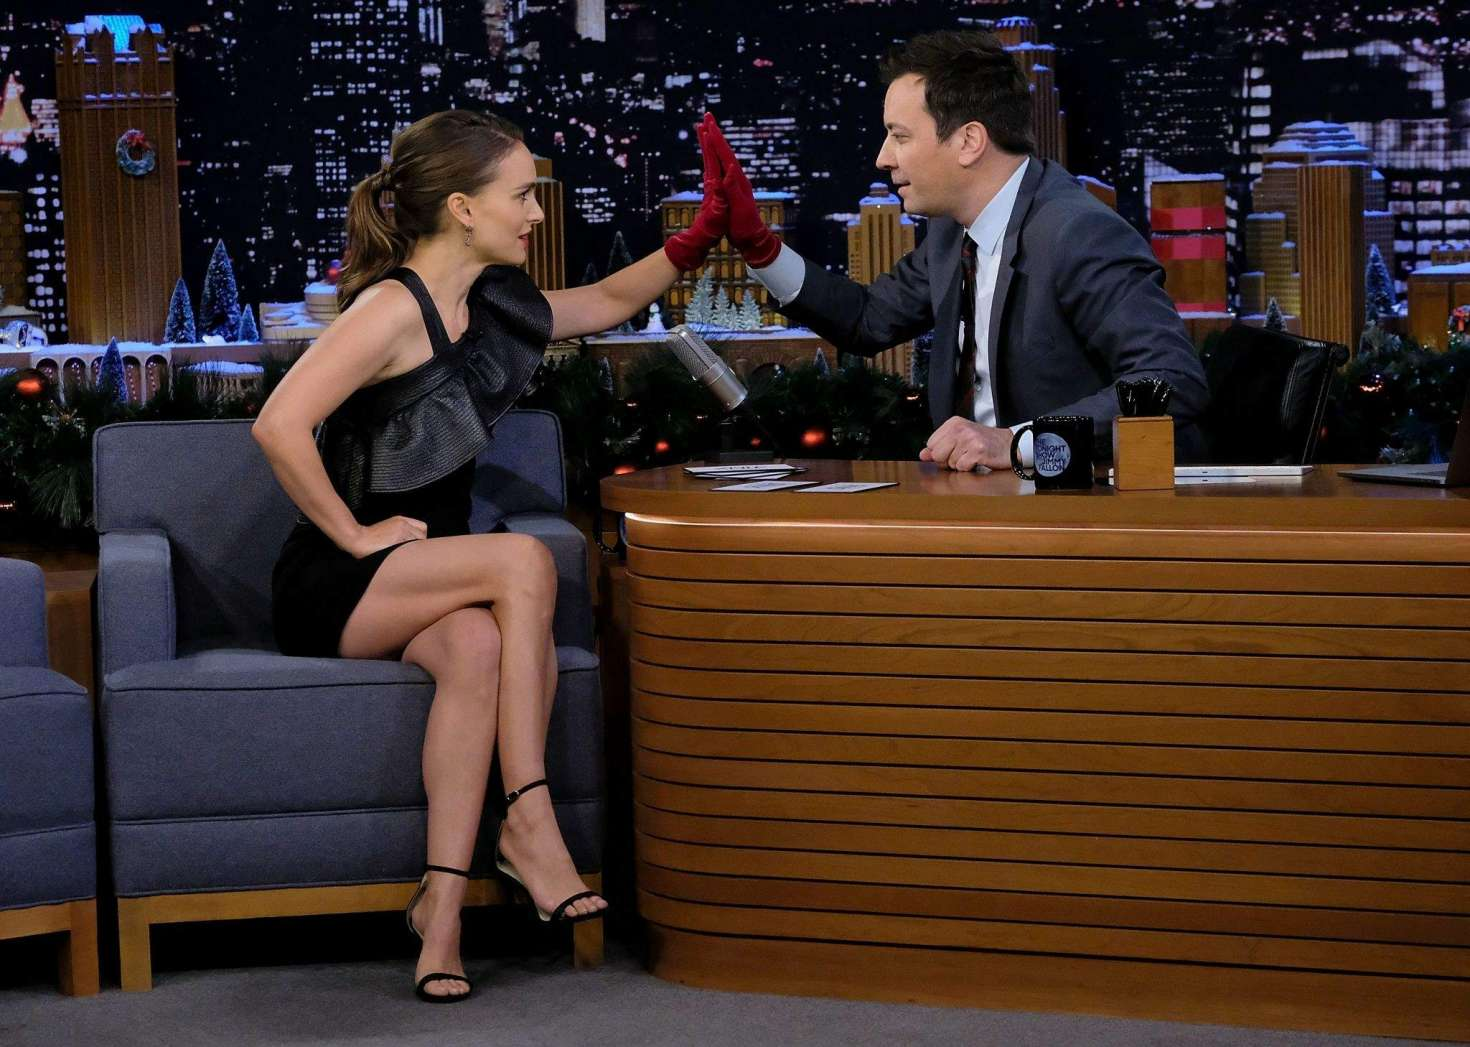 Natalie Portman 2018 : Natalie Portman: The Tonight Show Starring Jimmy Fallon -03